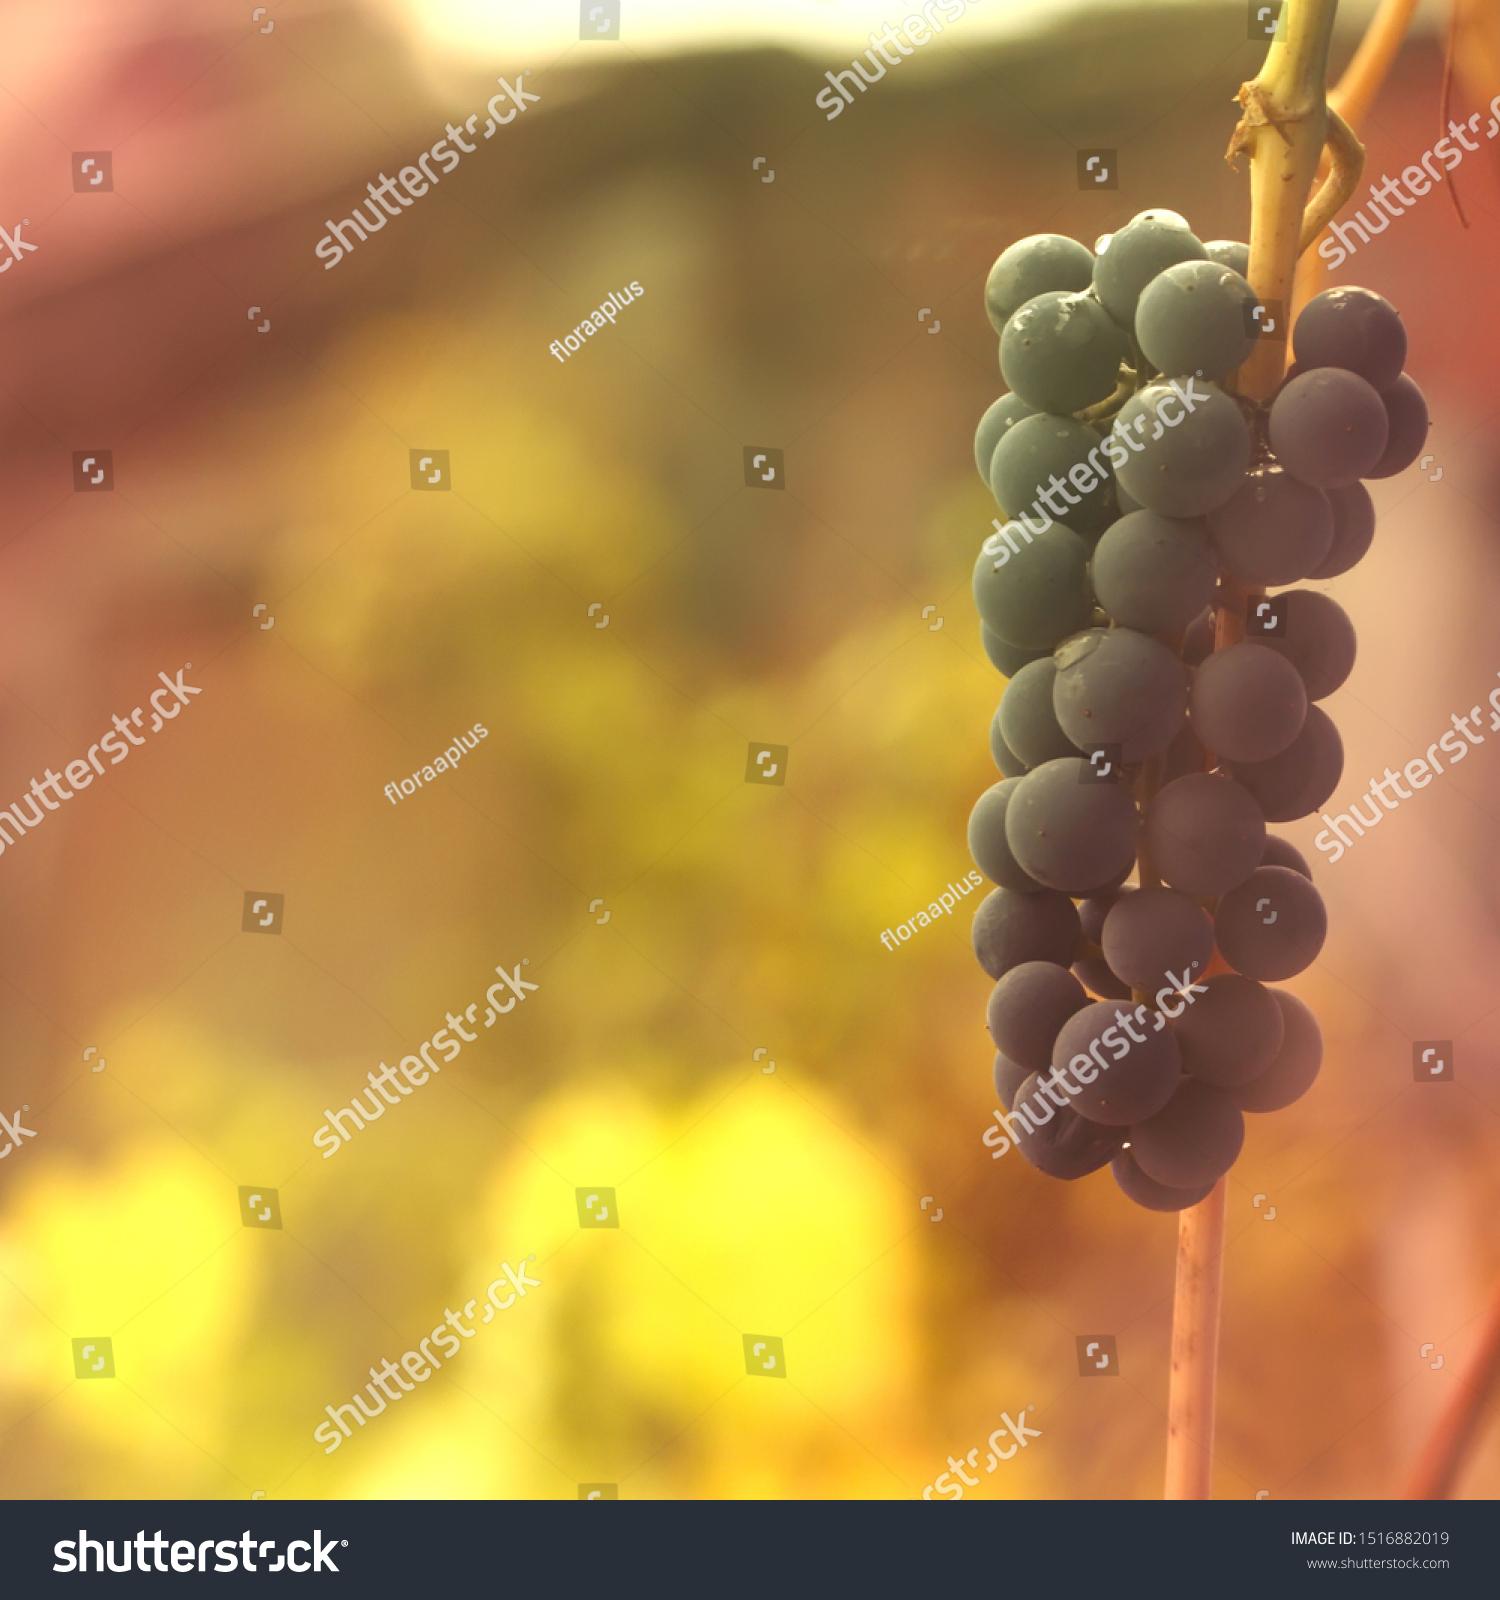 stock-photo-tender-autumn-background-wit